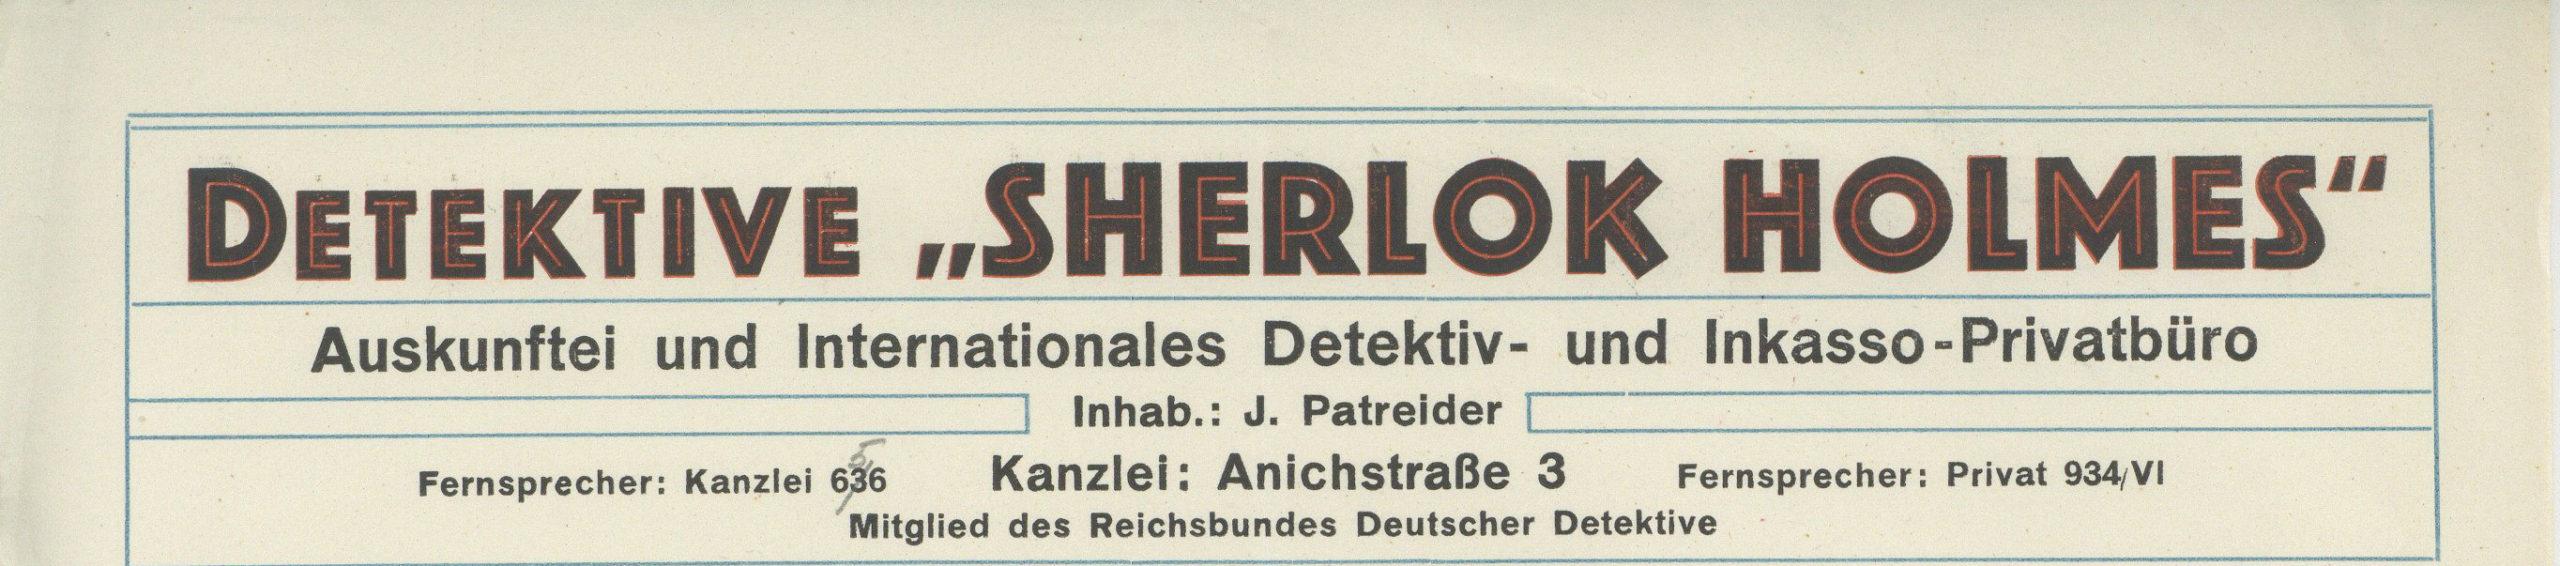 Sherlock Holmes Ermittelt In Innsbruck